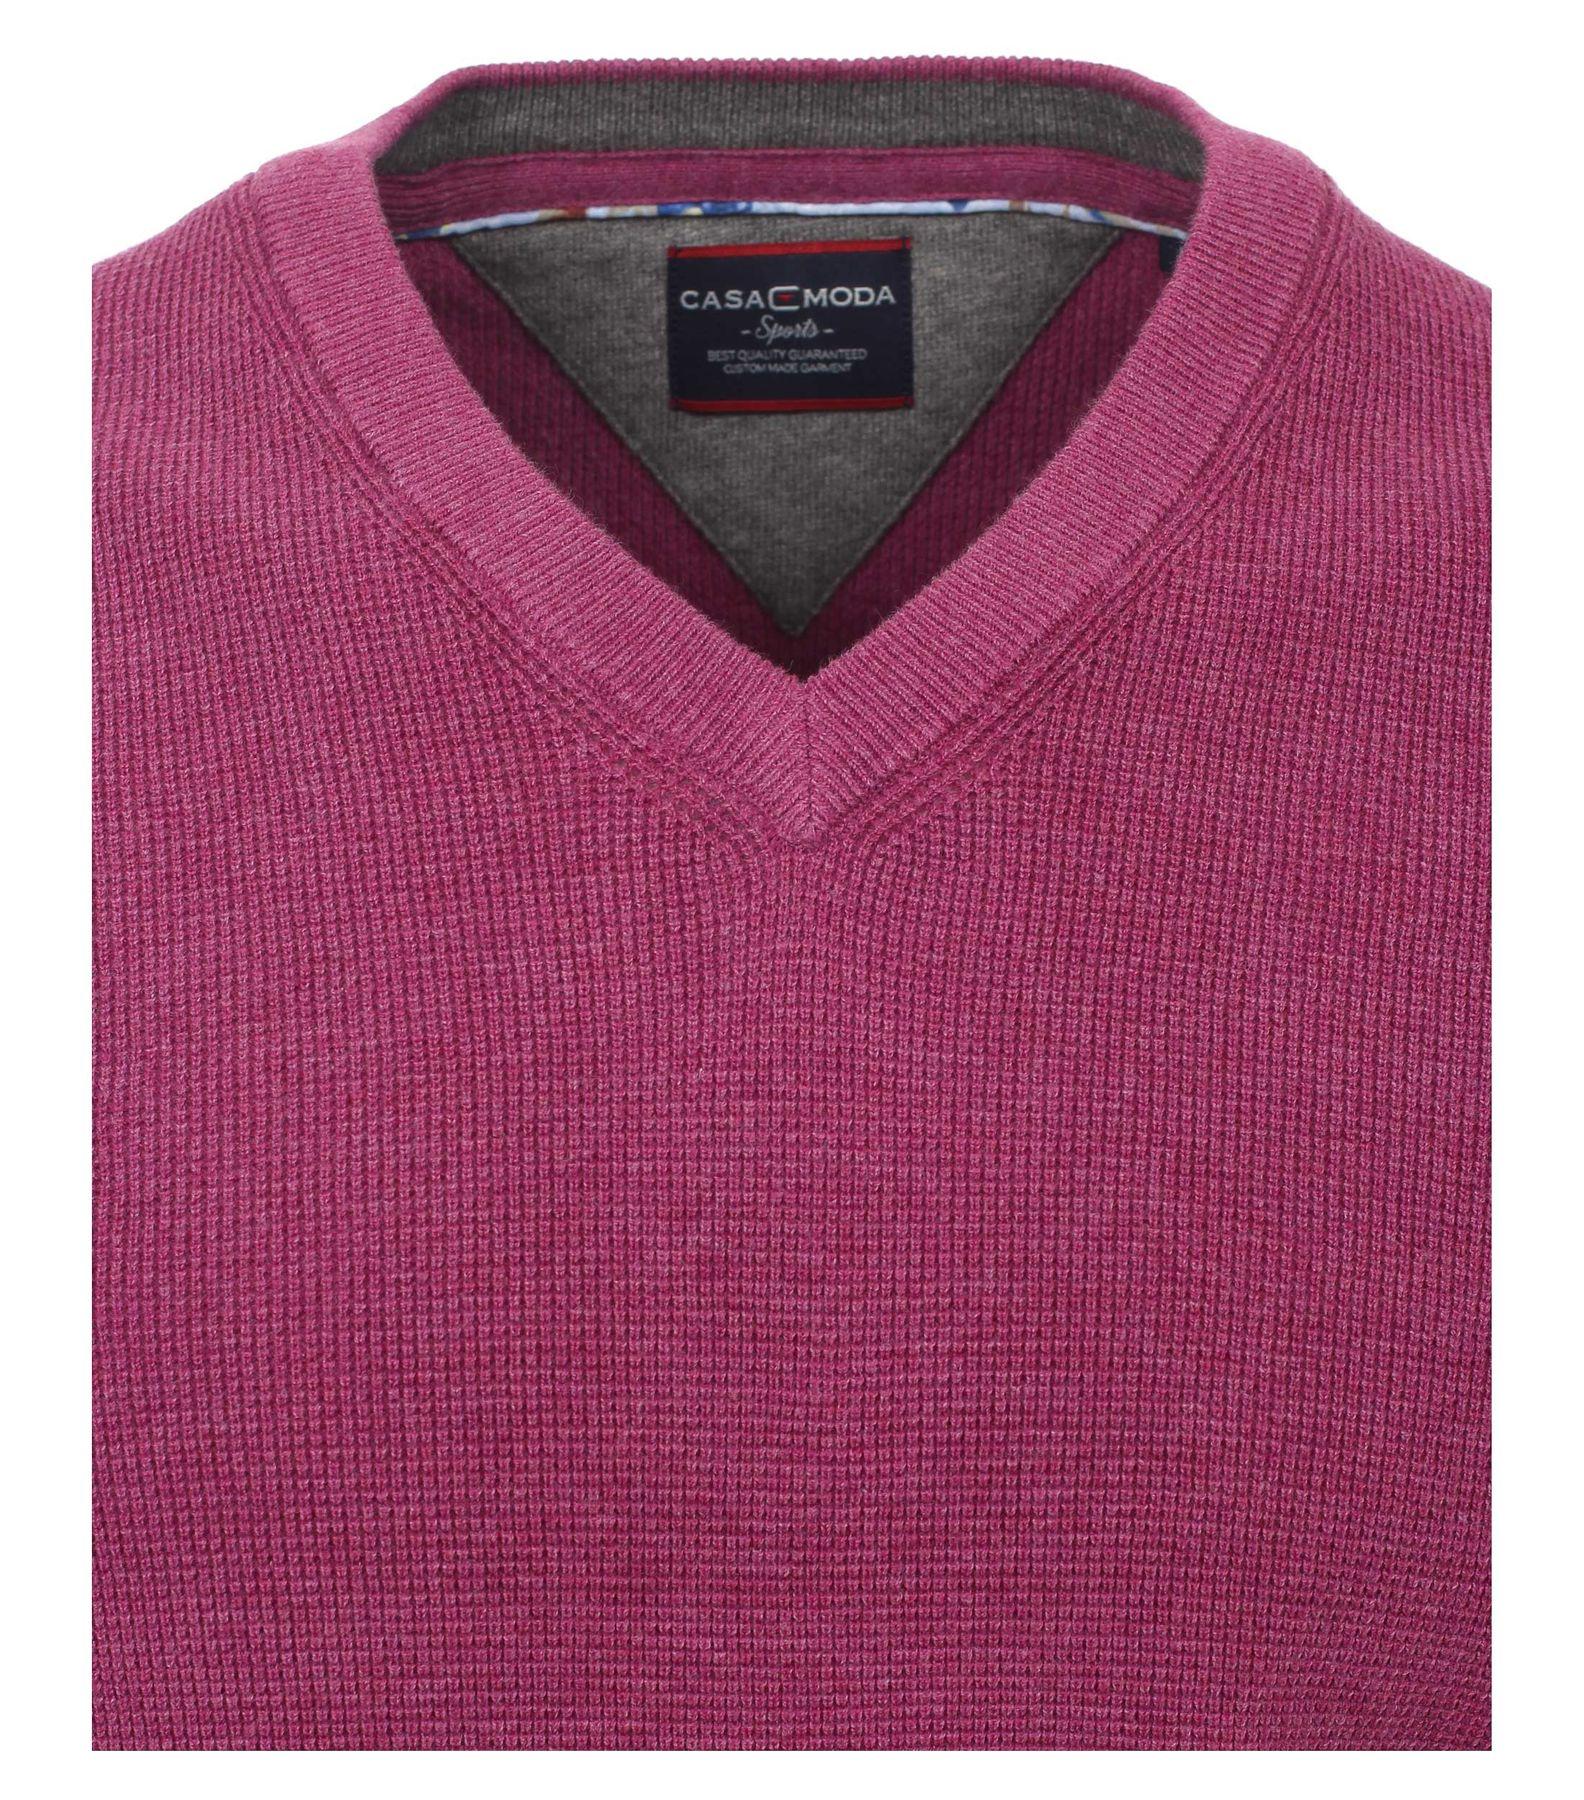 Casa Moda - Unifarbener Herren Pullover mit V-Ausschnitt  (472625000) – Bild 18